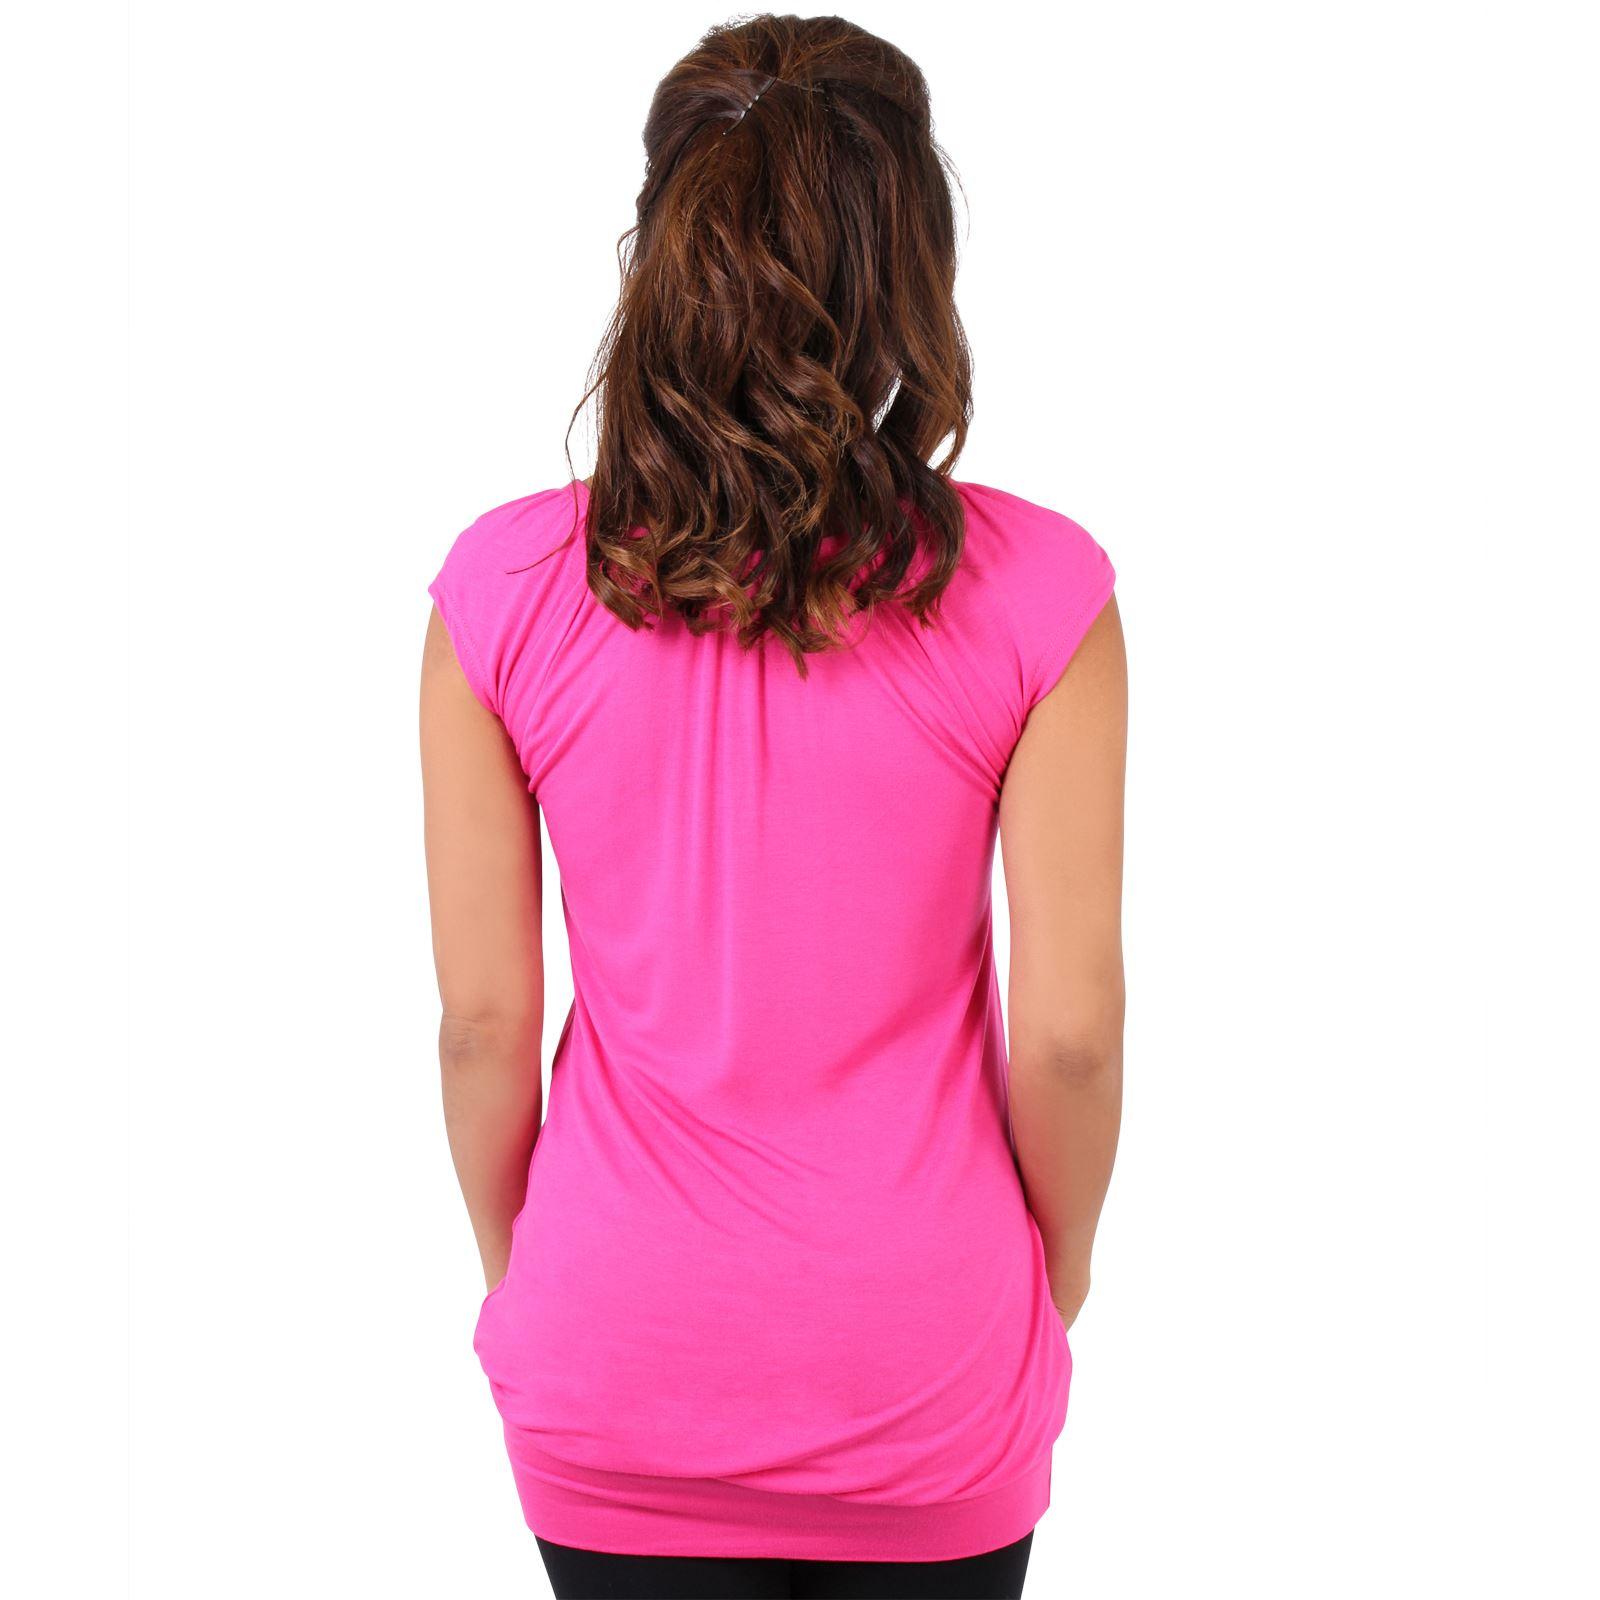 Womens-Ladies-Scoop-Neck-Blouse-V-T-Shirt-Long-Short-Sleeve-Plain-Loose-Top thumbnail 14